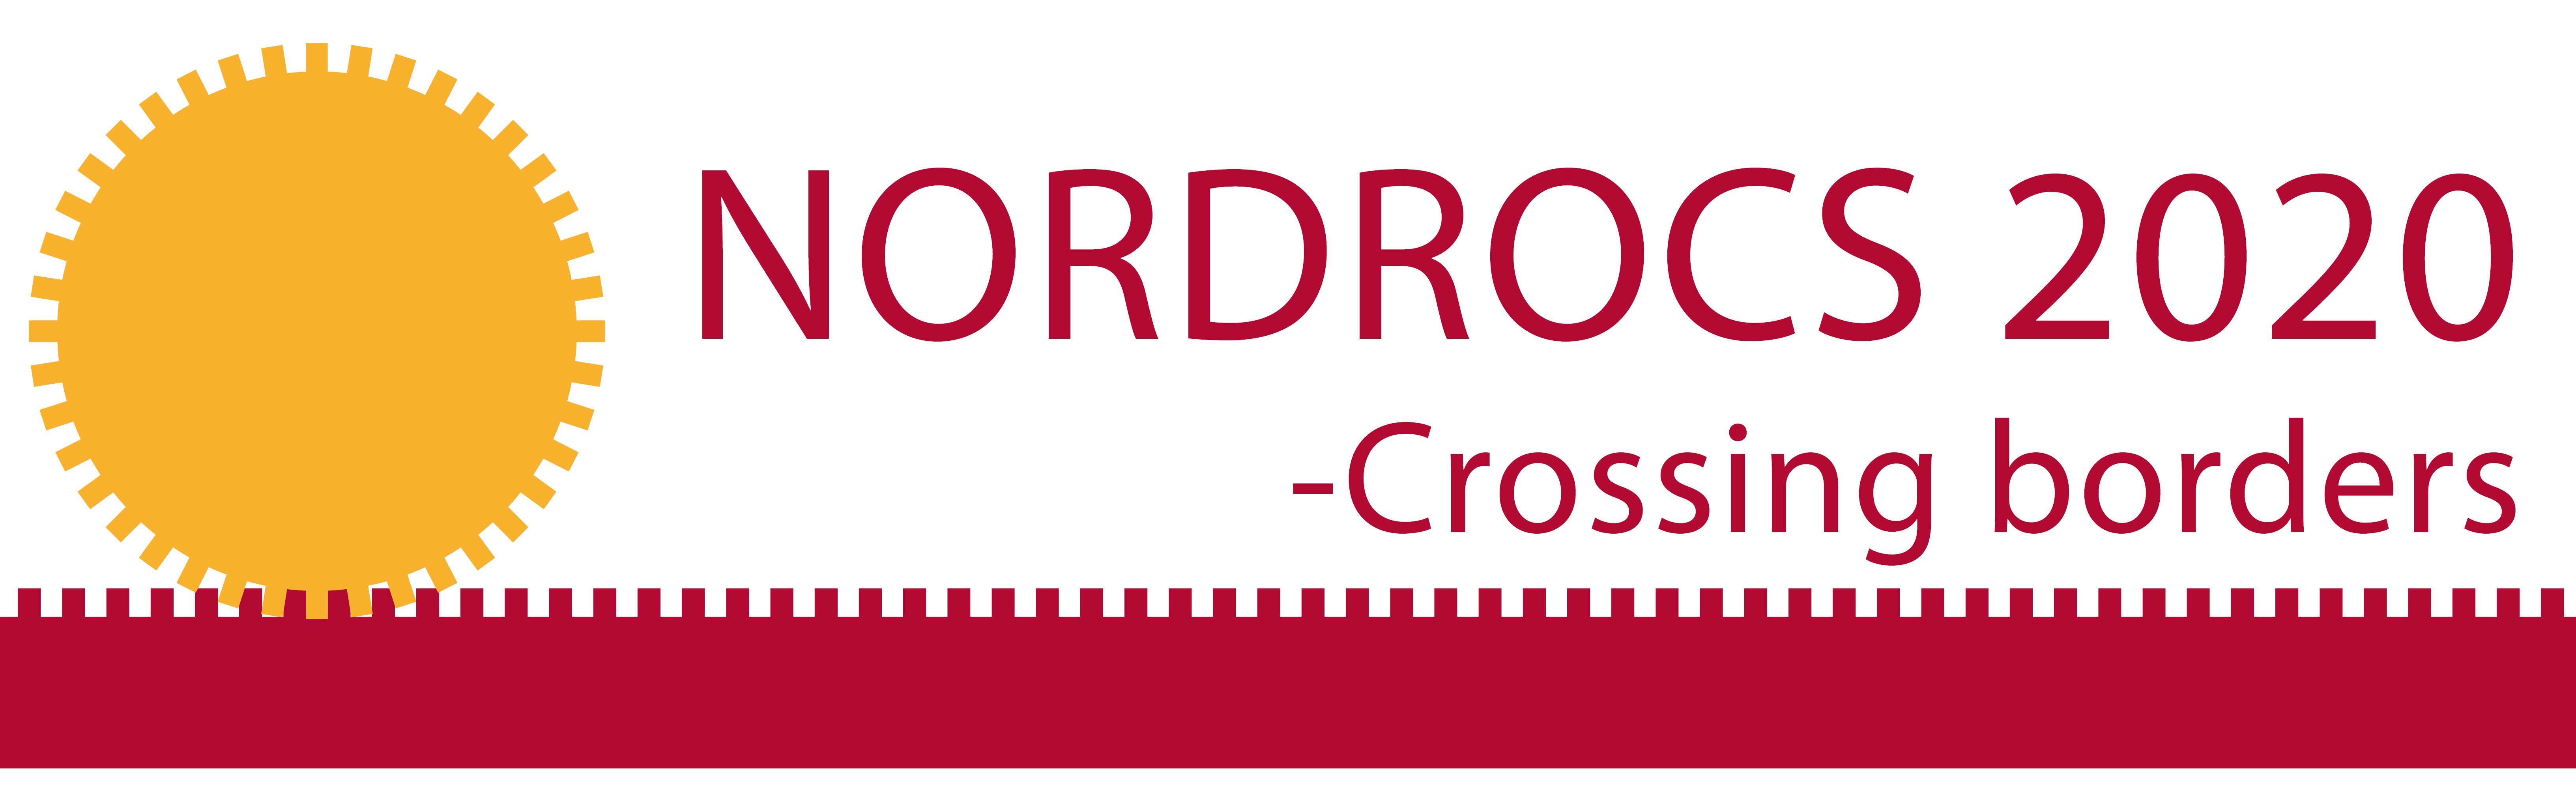 Nordrocs 2020